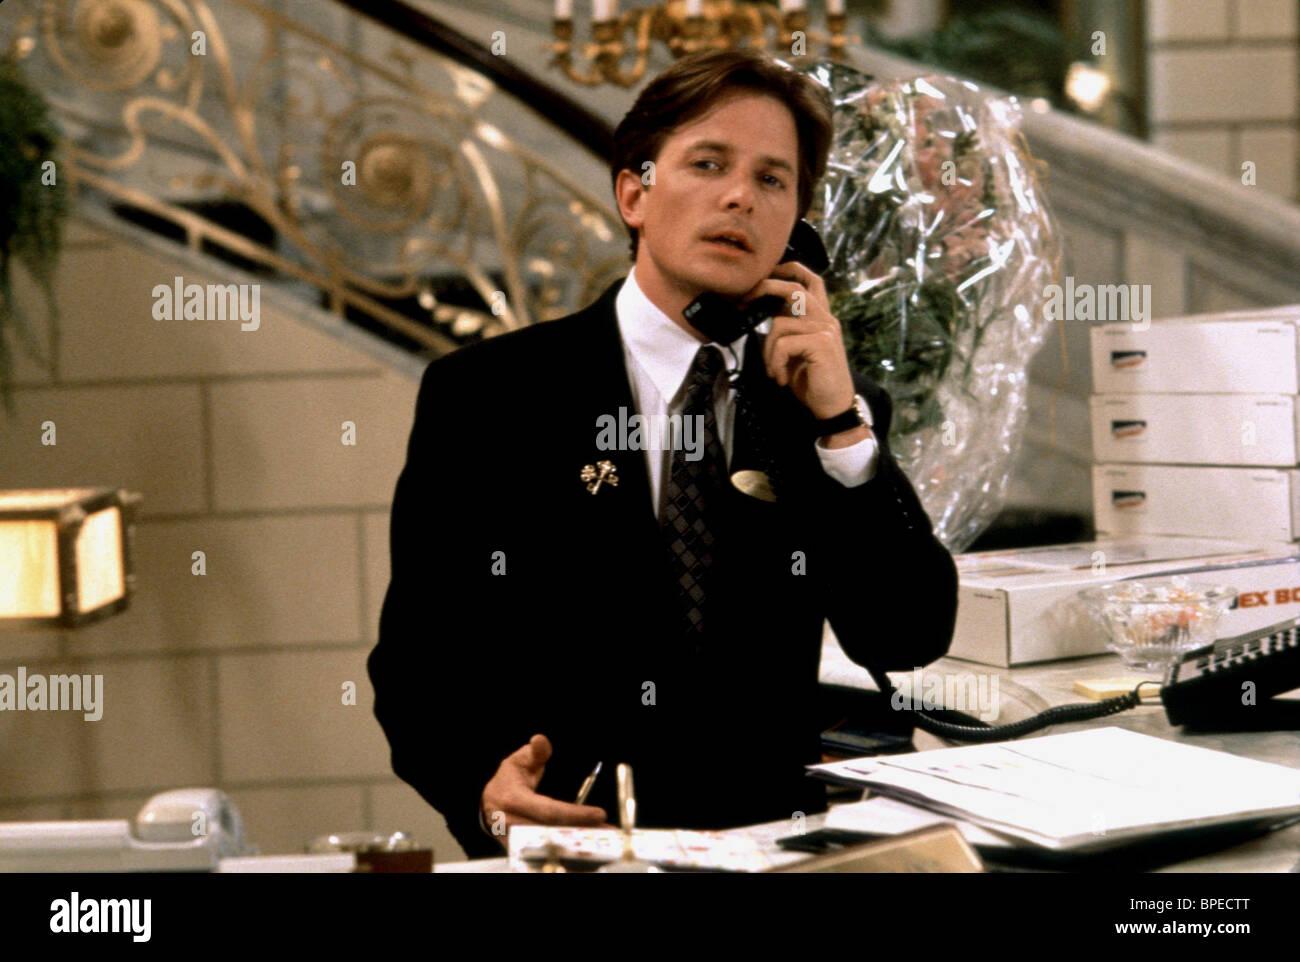 Michael J Fox The Concierge For Love Or Money 1993 Stock Photo Alamy